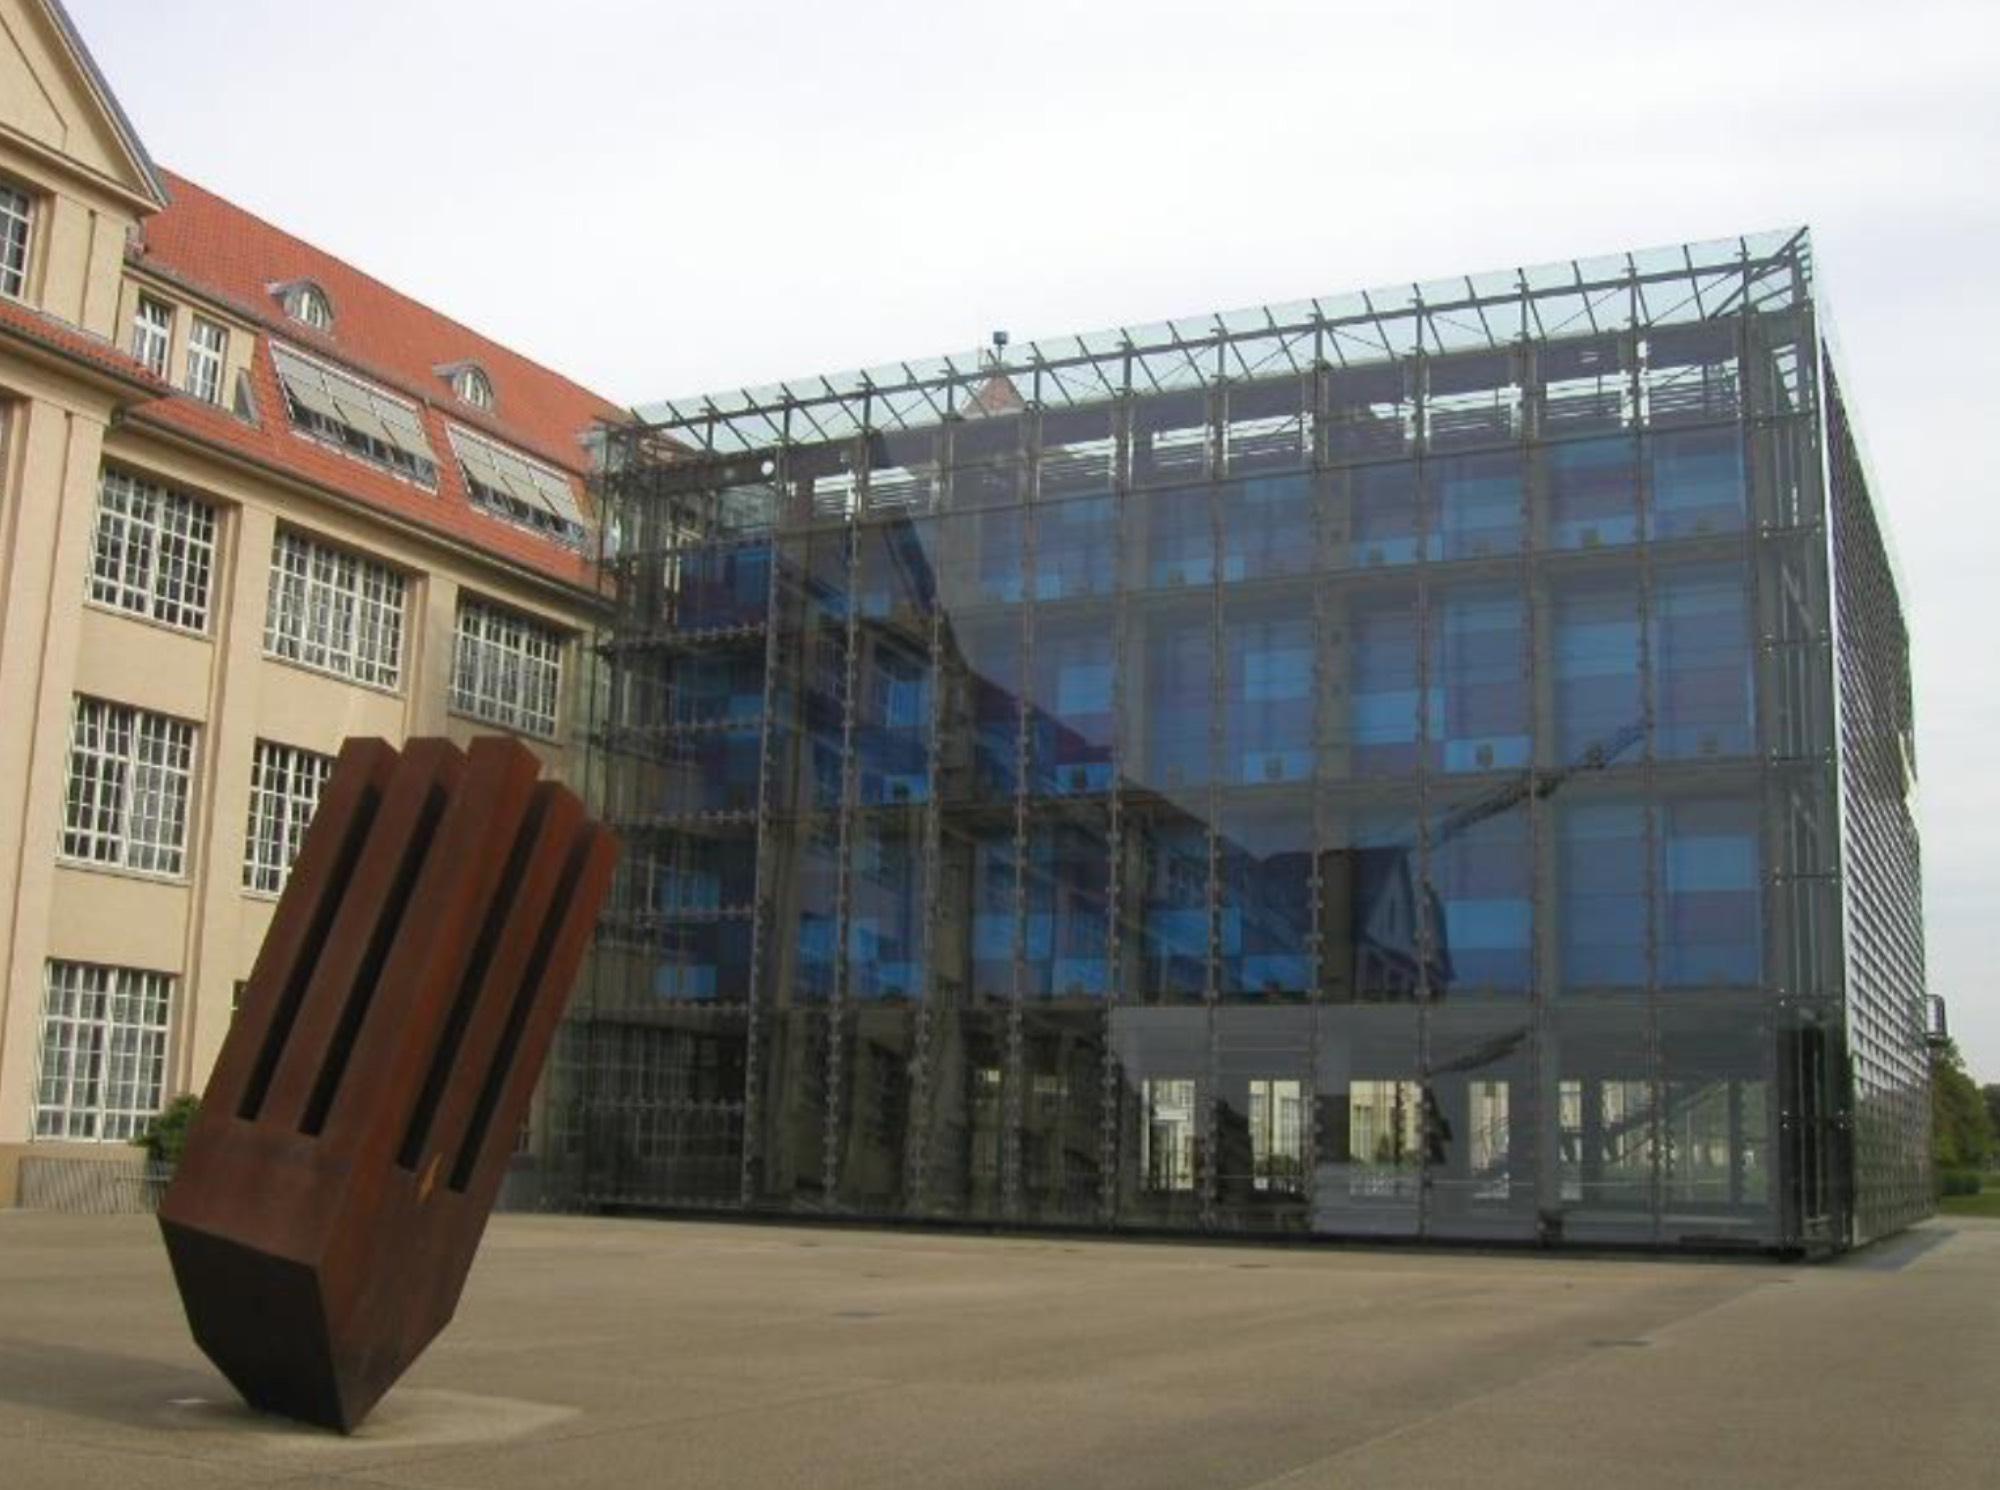 Bauhaus  vs. Digital Bauhaus: Οριοθετώντας την ονομασία